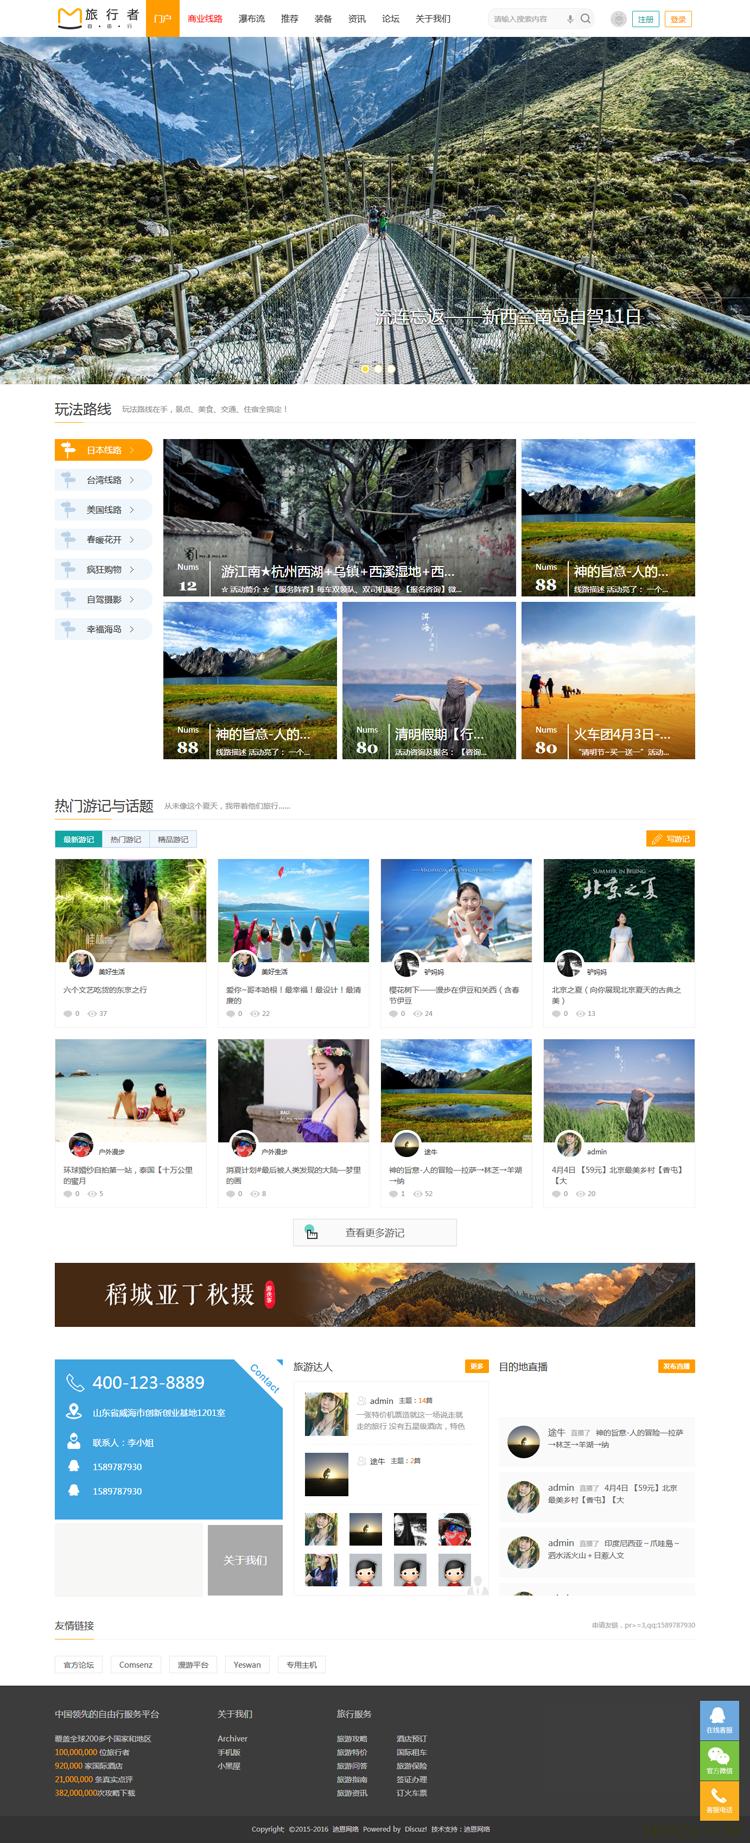 DiscuzX3.2模板 迪恩户外旅行者! 商业版(GBK) dz3.2旅游旅行网站